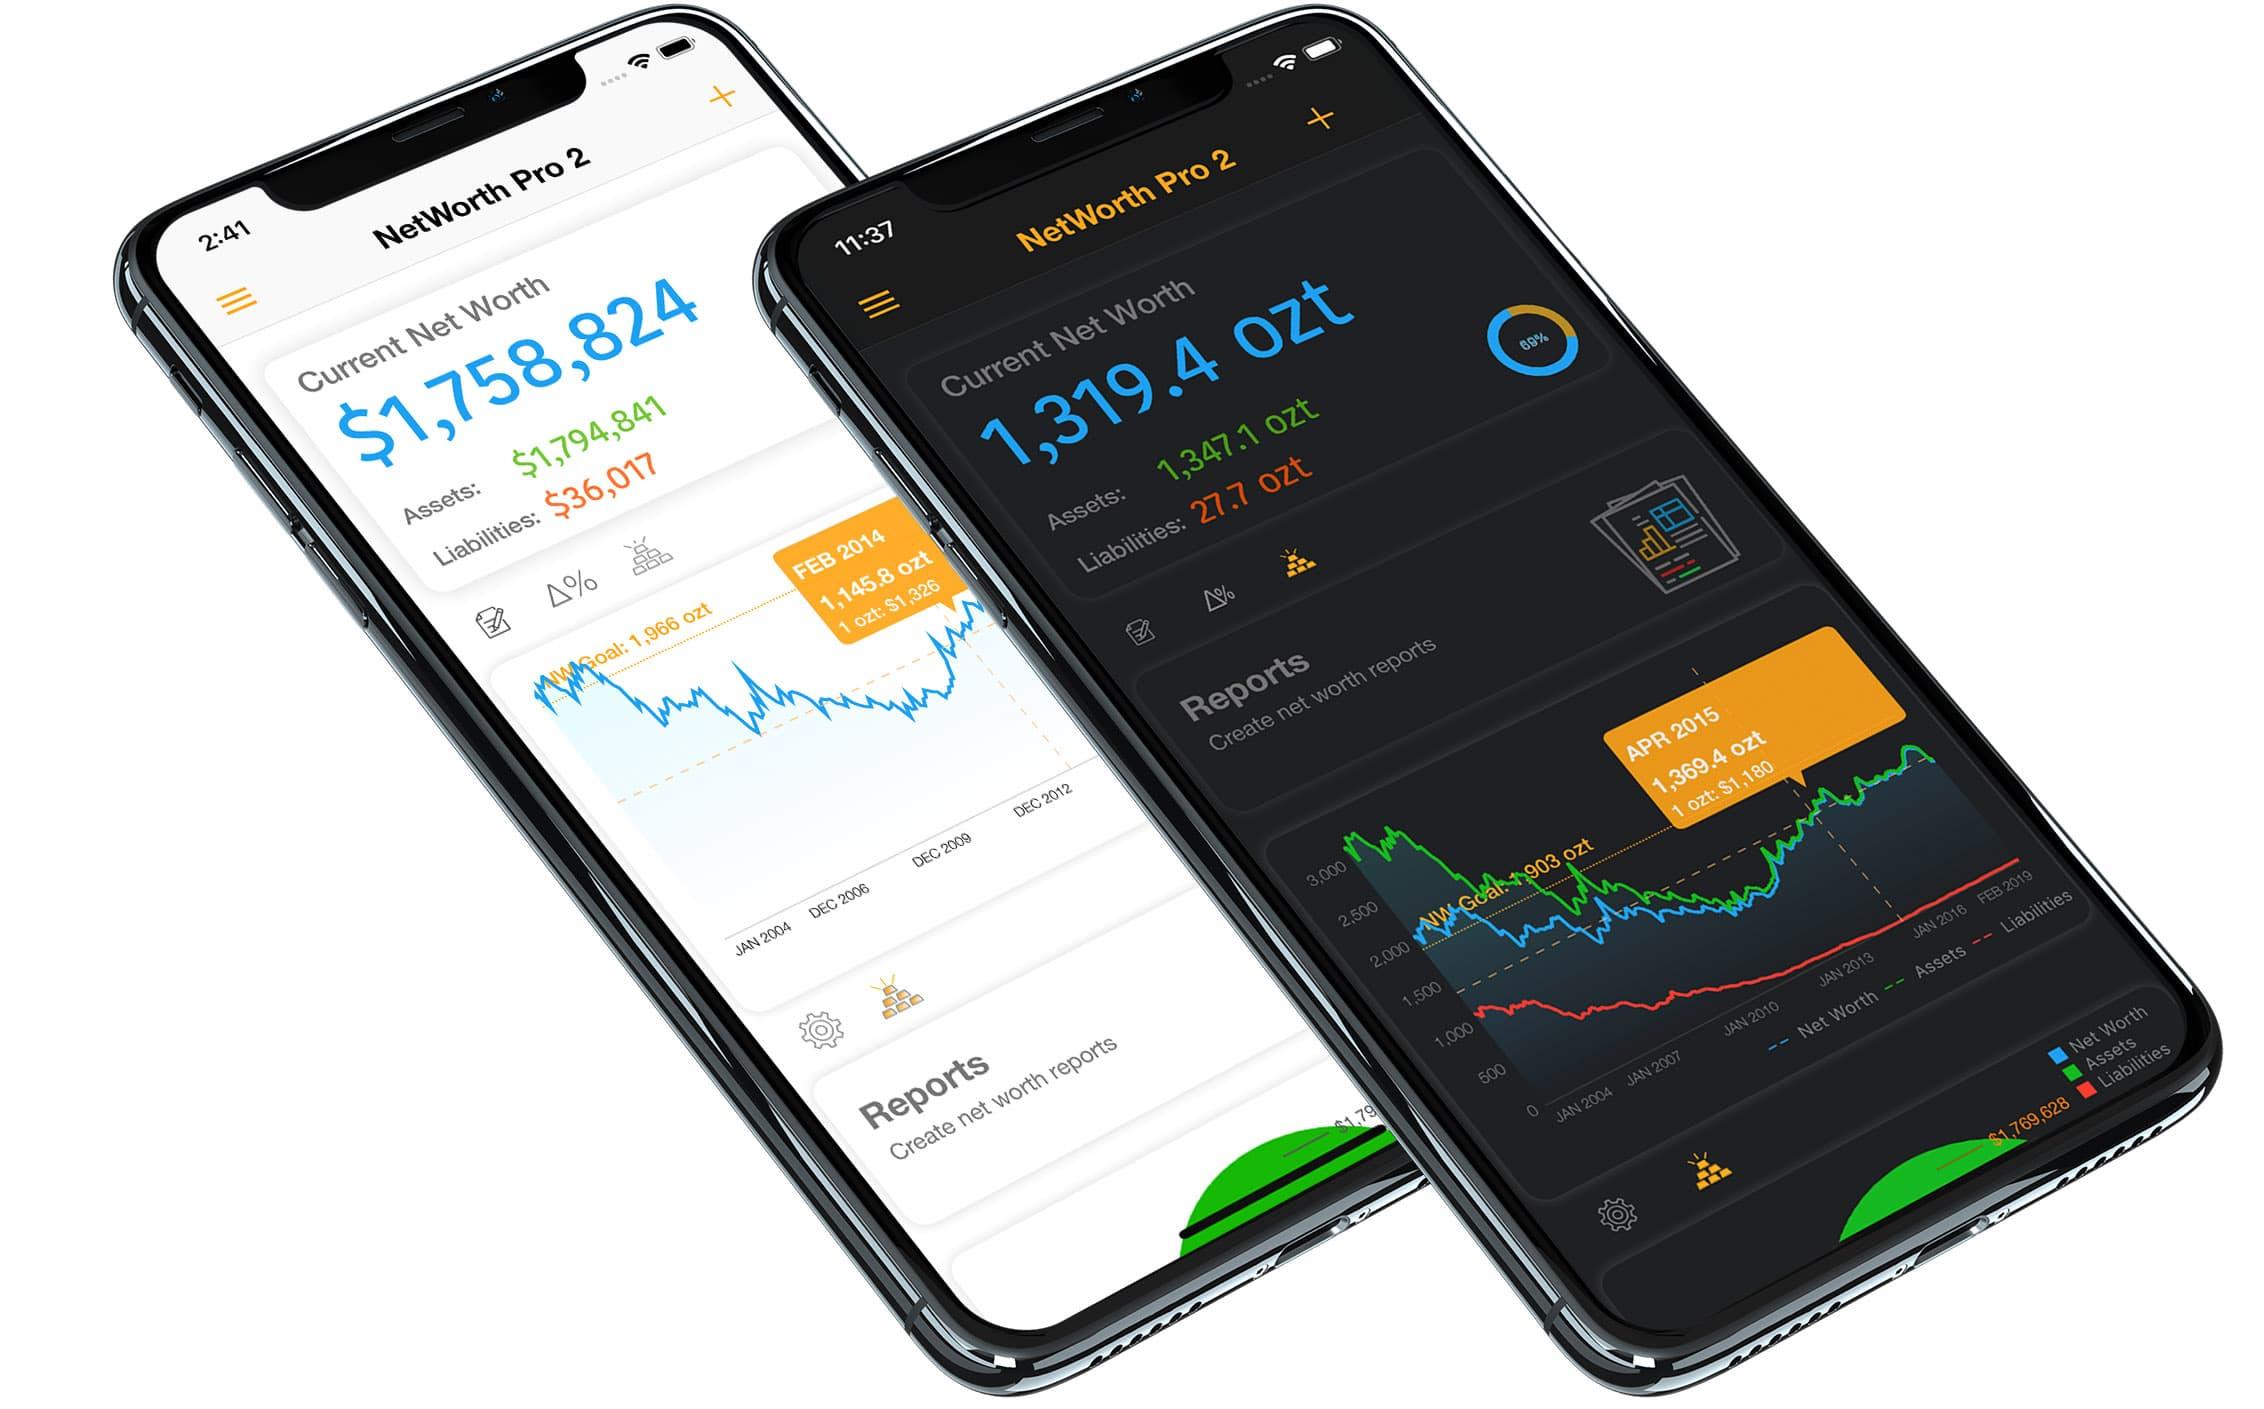 Net Worth Pro 2 iOS